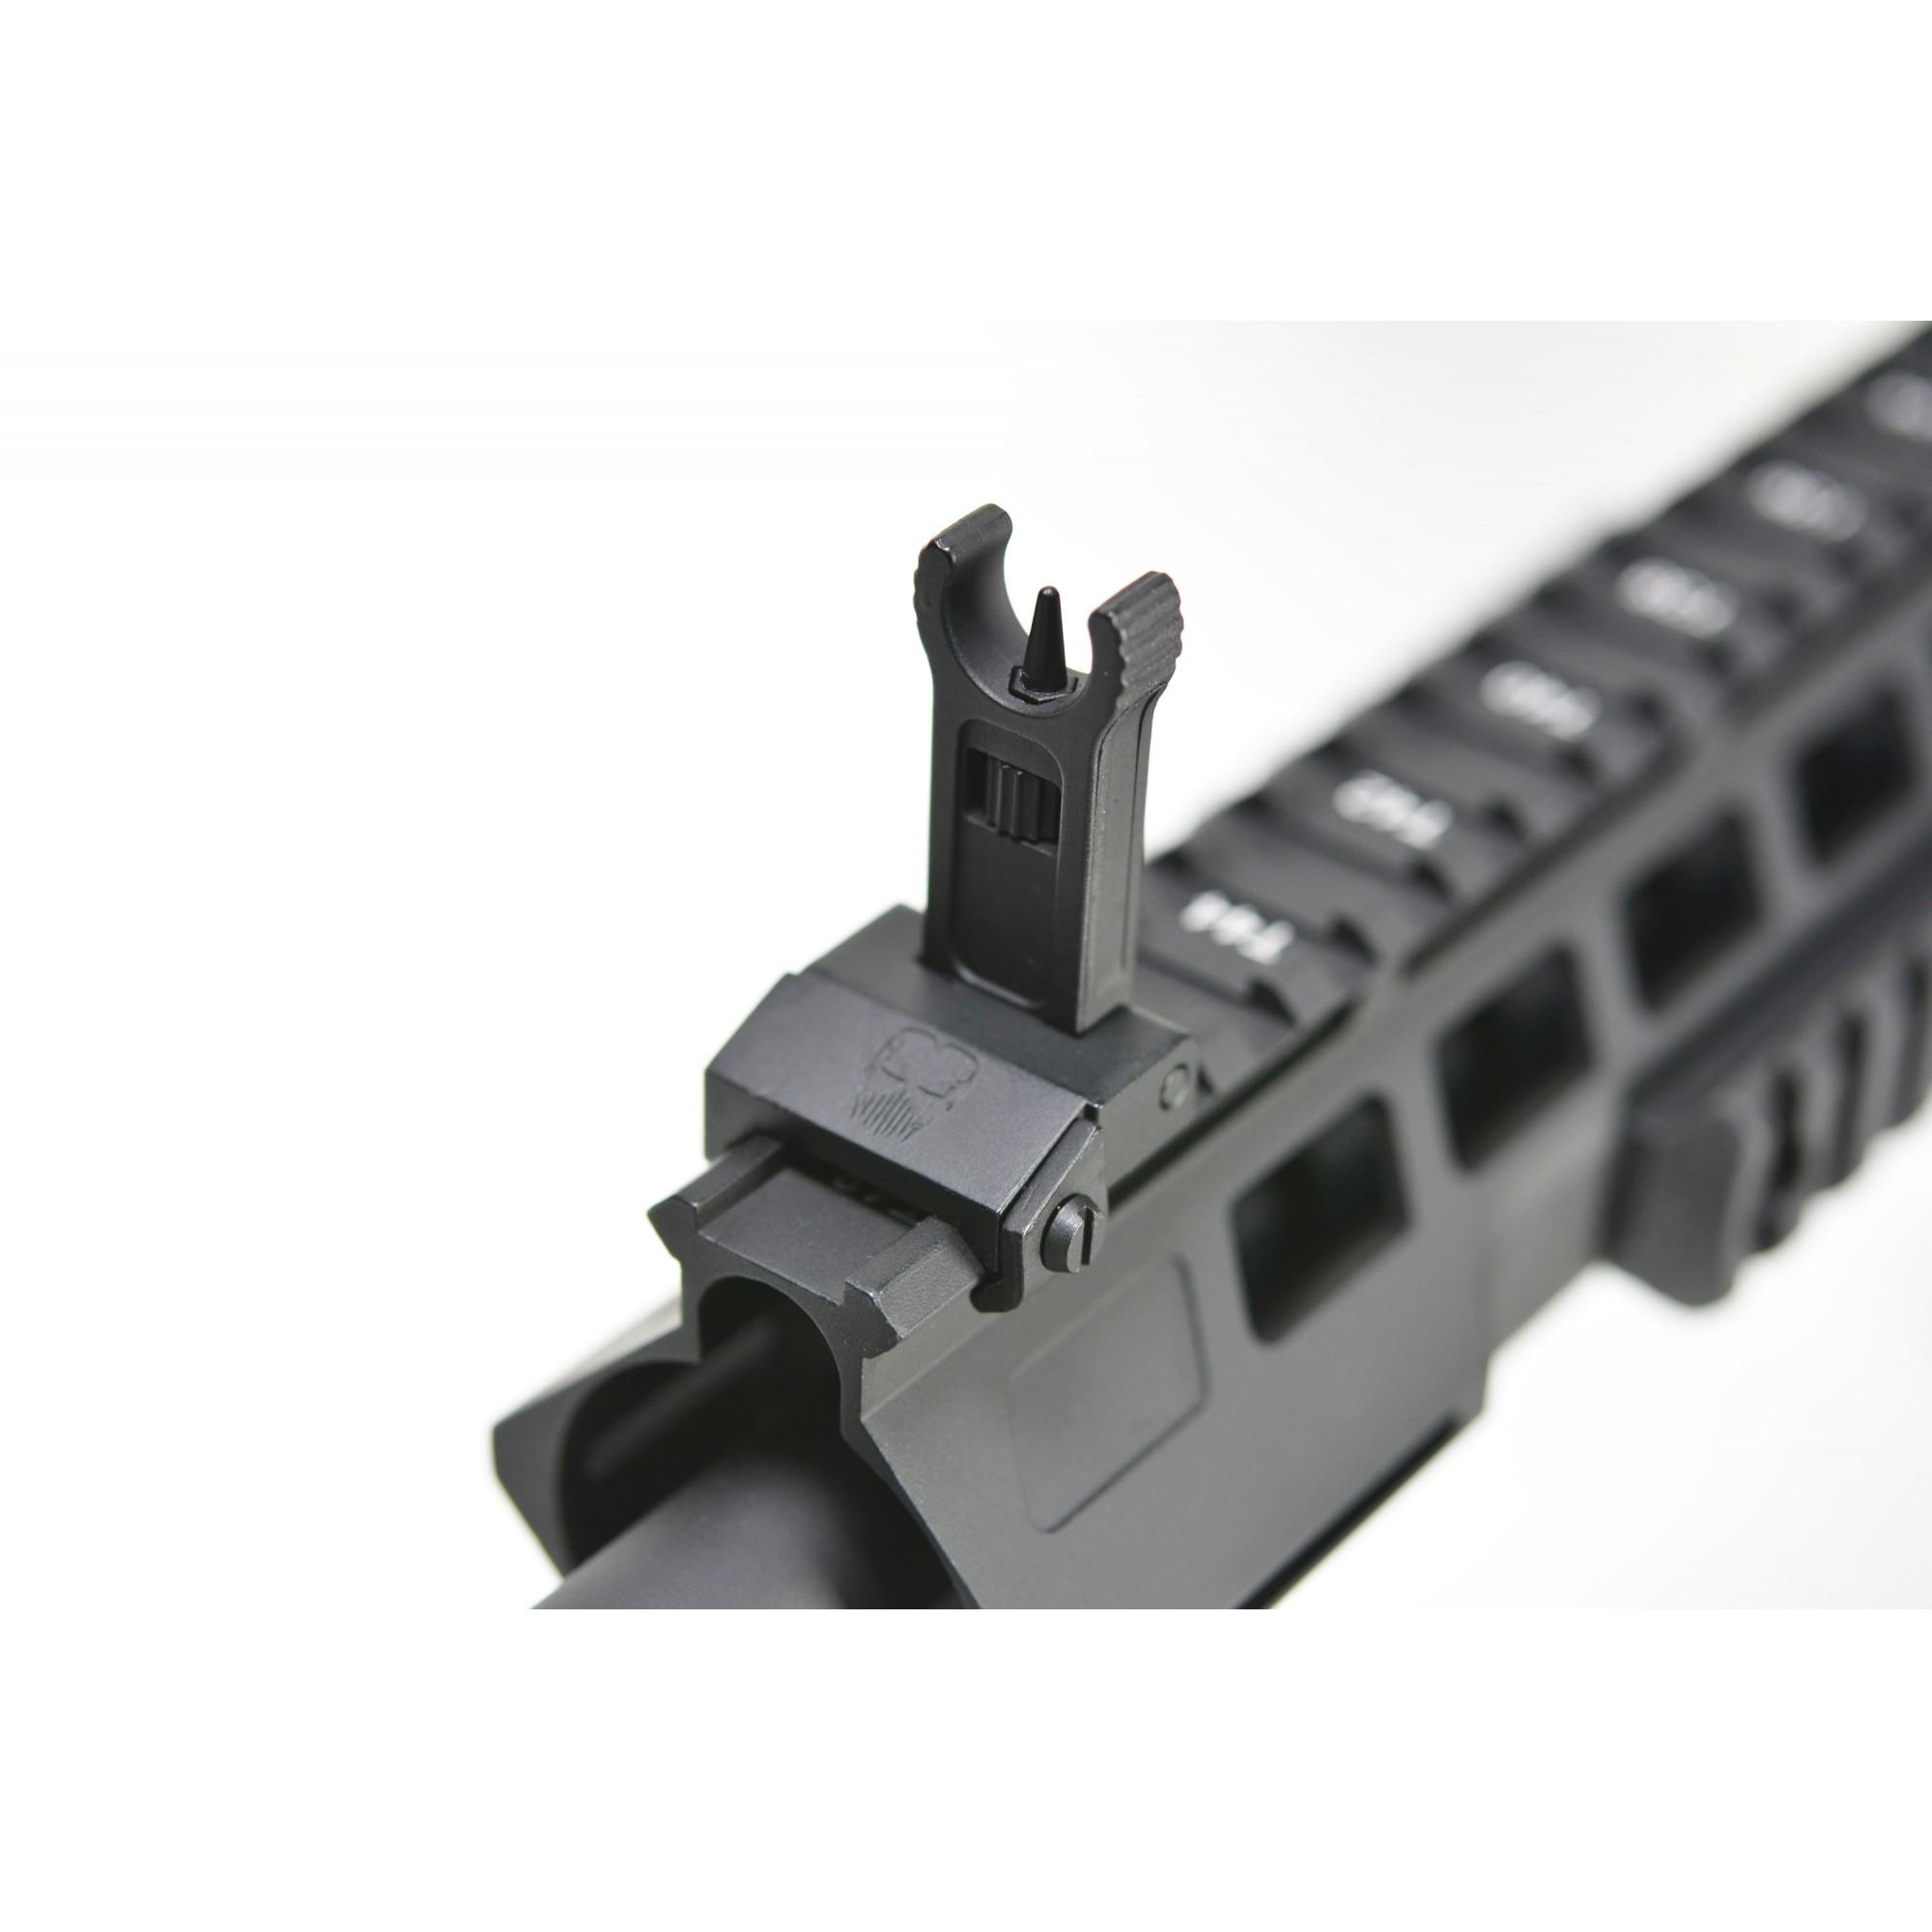 RIFLE DE AIRSOFT AEG M4 PHANTOM EXTREMIS RIFLES 12.5 FULL METAL BLOWBACK eMARK III-B - APS